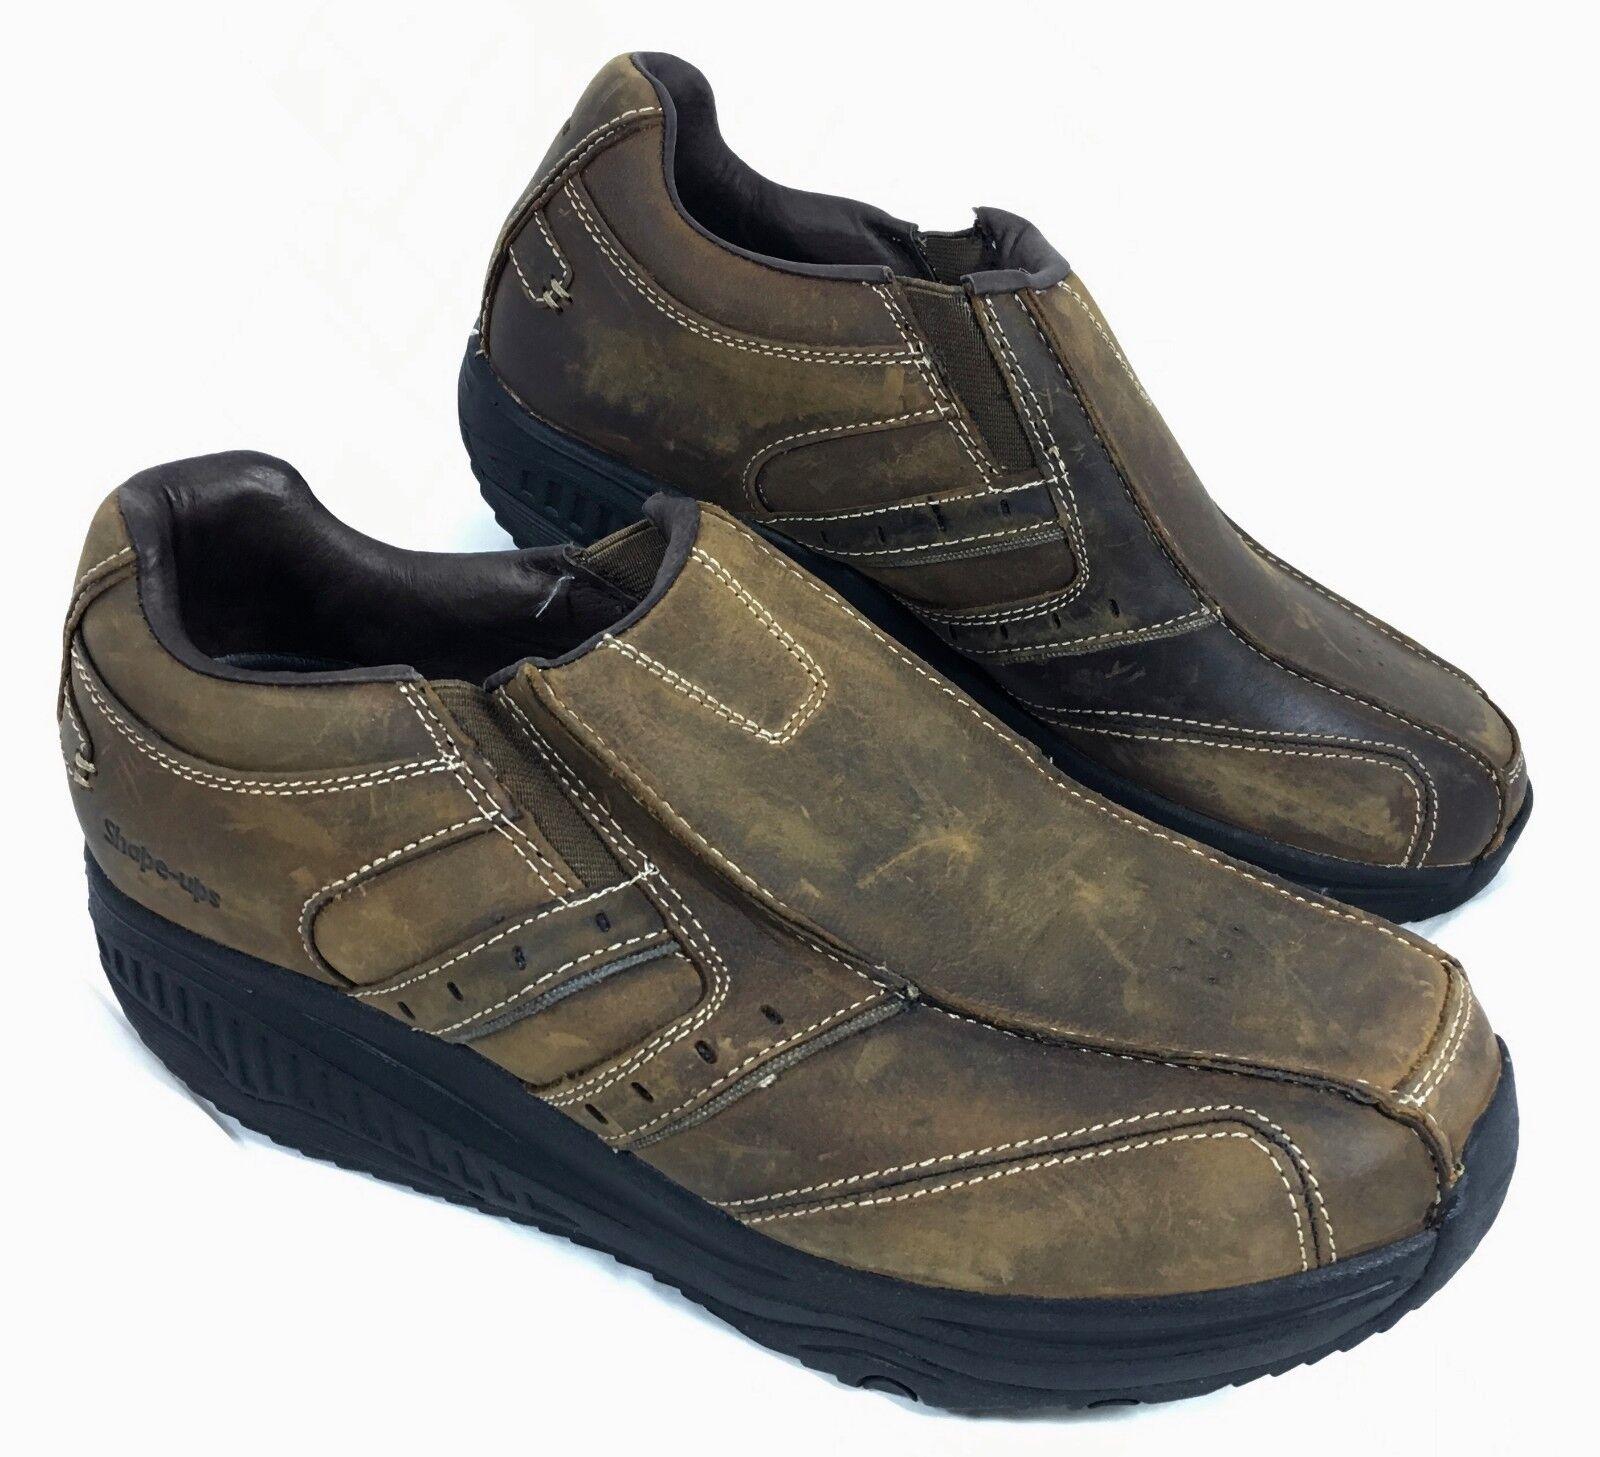 NEW Men's Brown Skechers Shape-Ups Strider Loafers Brown Men's Leather Sz 10.5 M bf8145